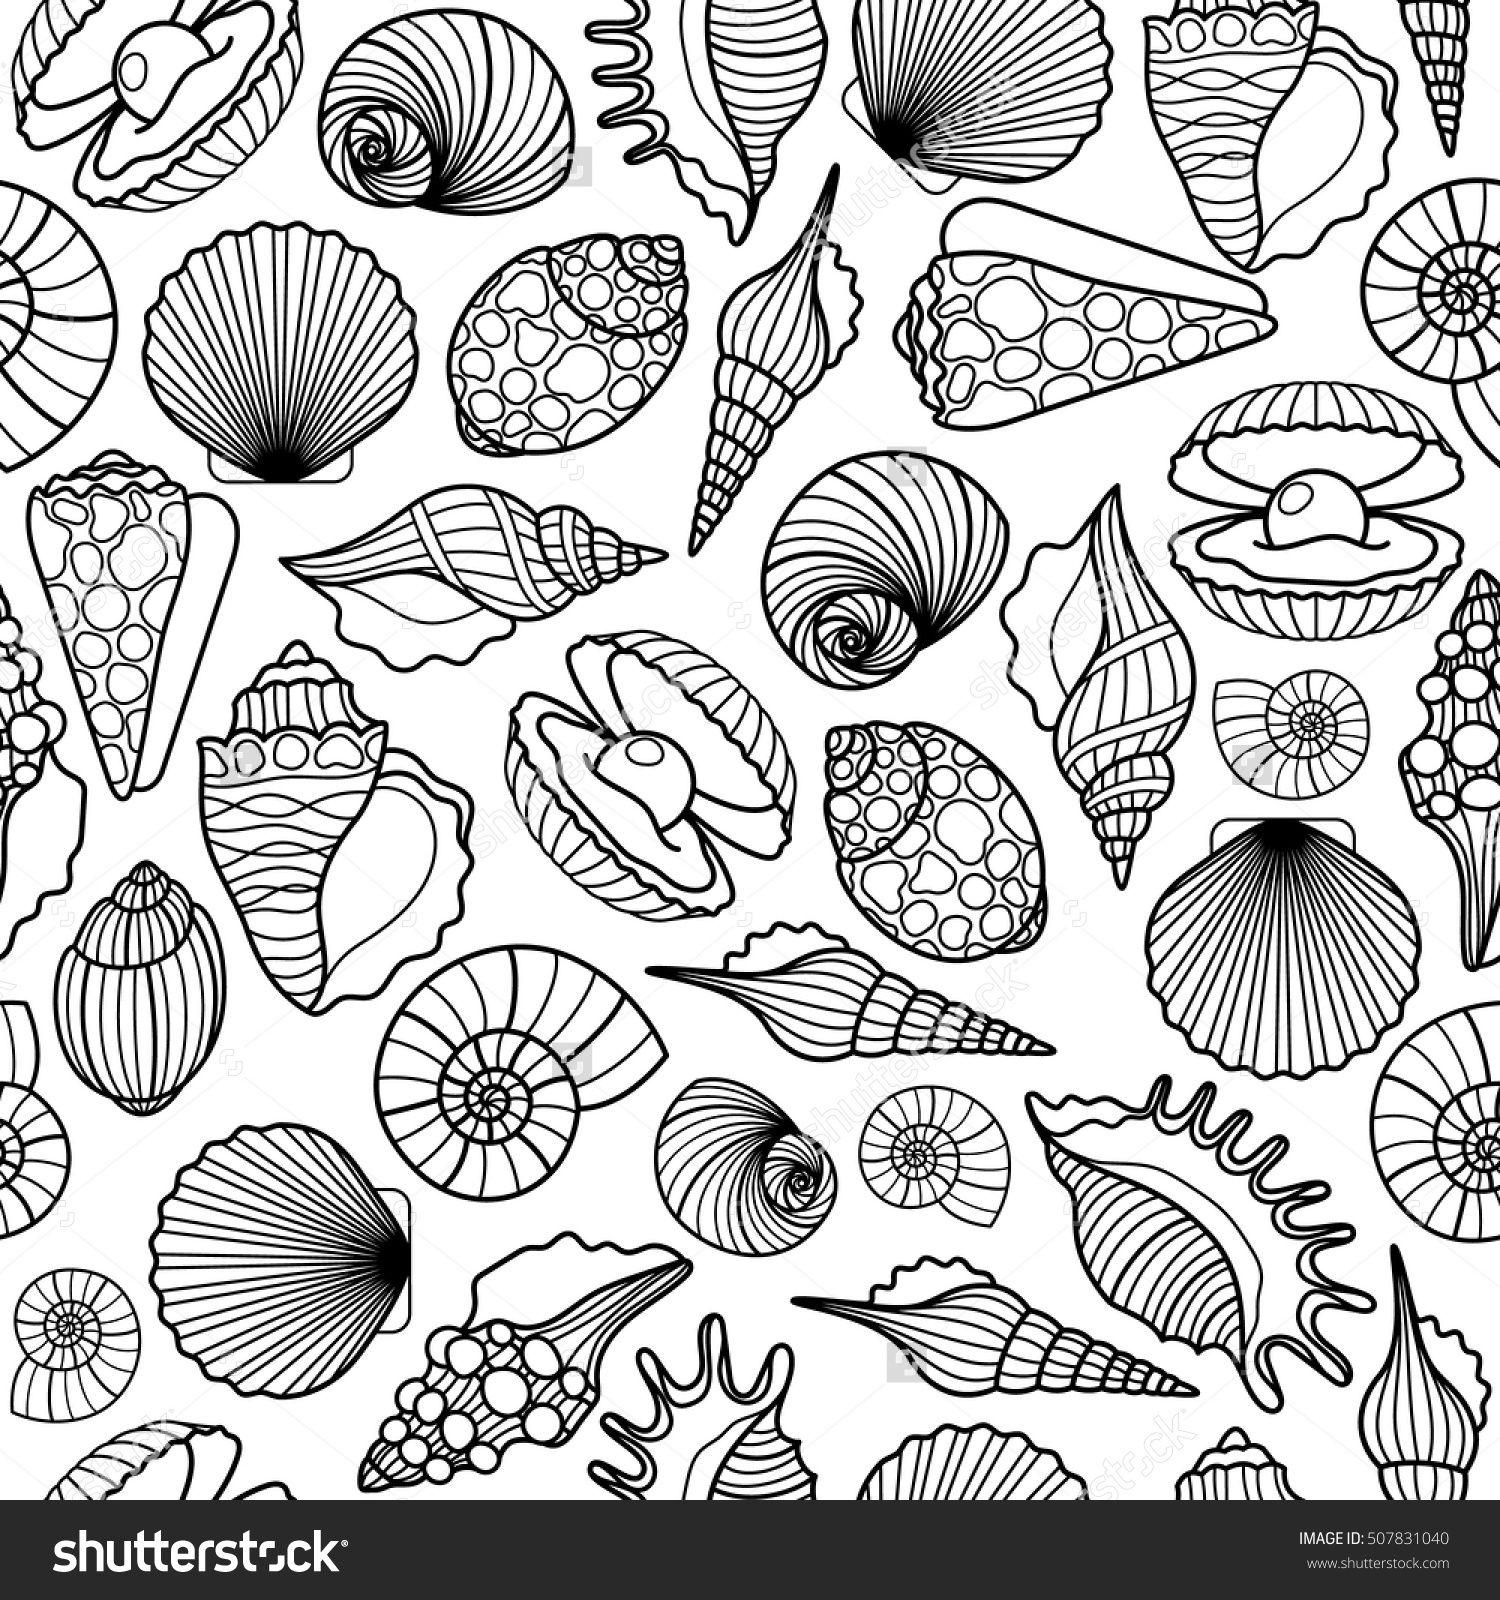 Hand Drawn Sea Shells Black Vector Seamless Pattern